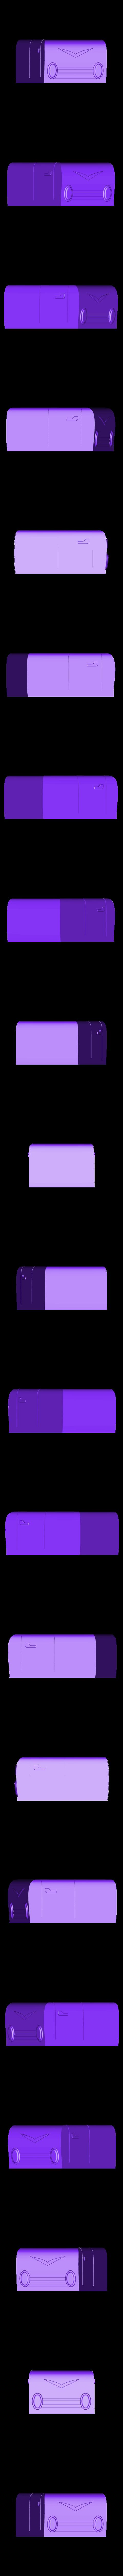 Crushy_Bottom.stl Télécharger fichier STL gratuit Crushinator from Futurama! • Objet pour impression 3D, ChaosCoreTech